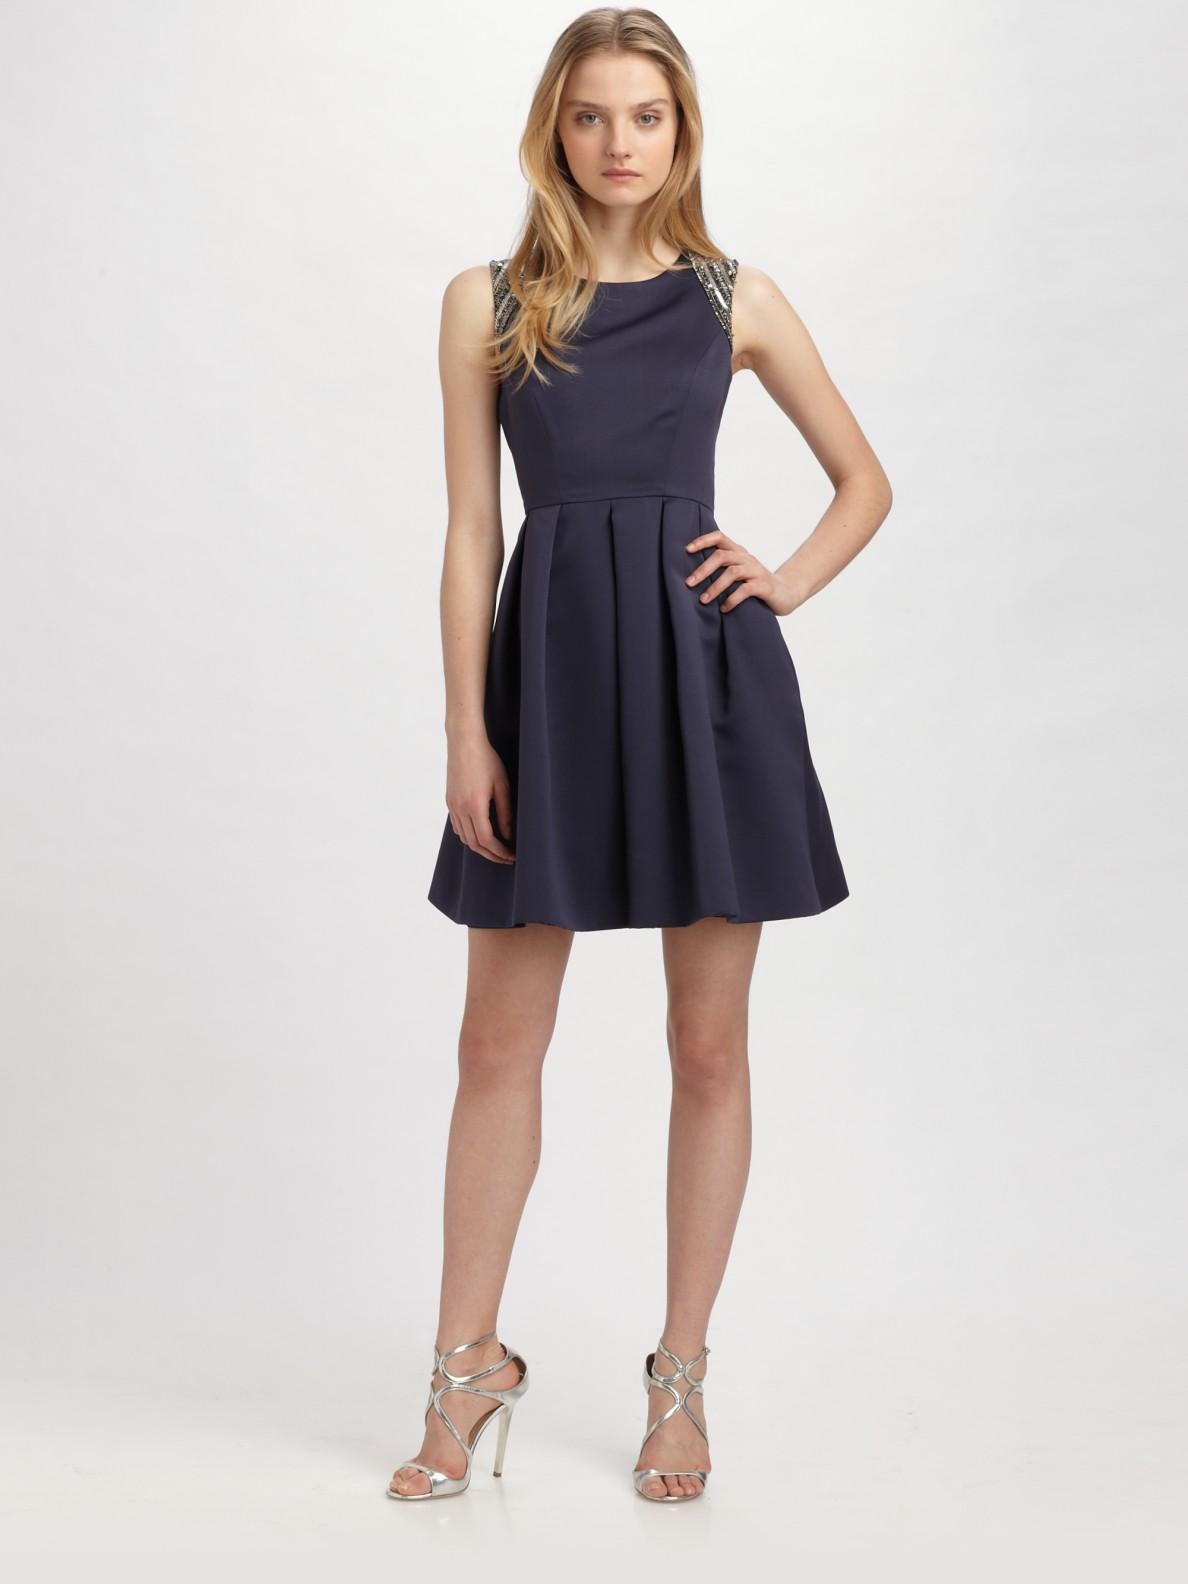 Starry Night Dresses